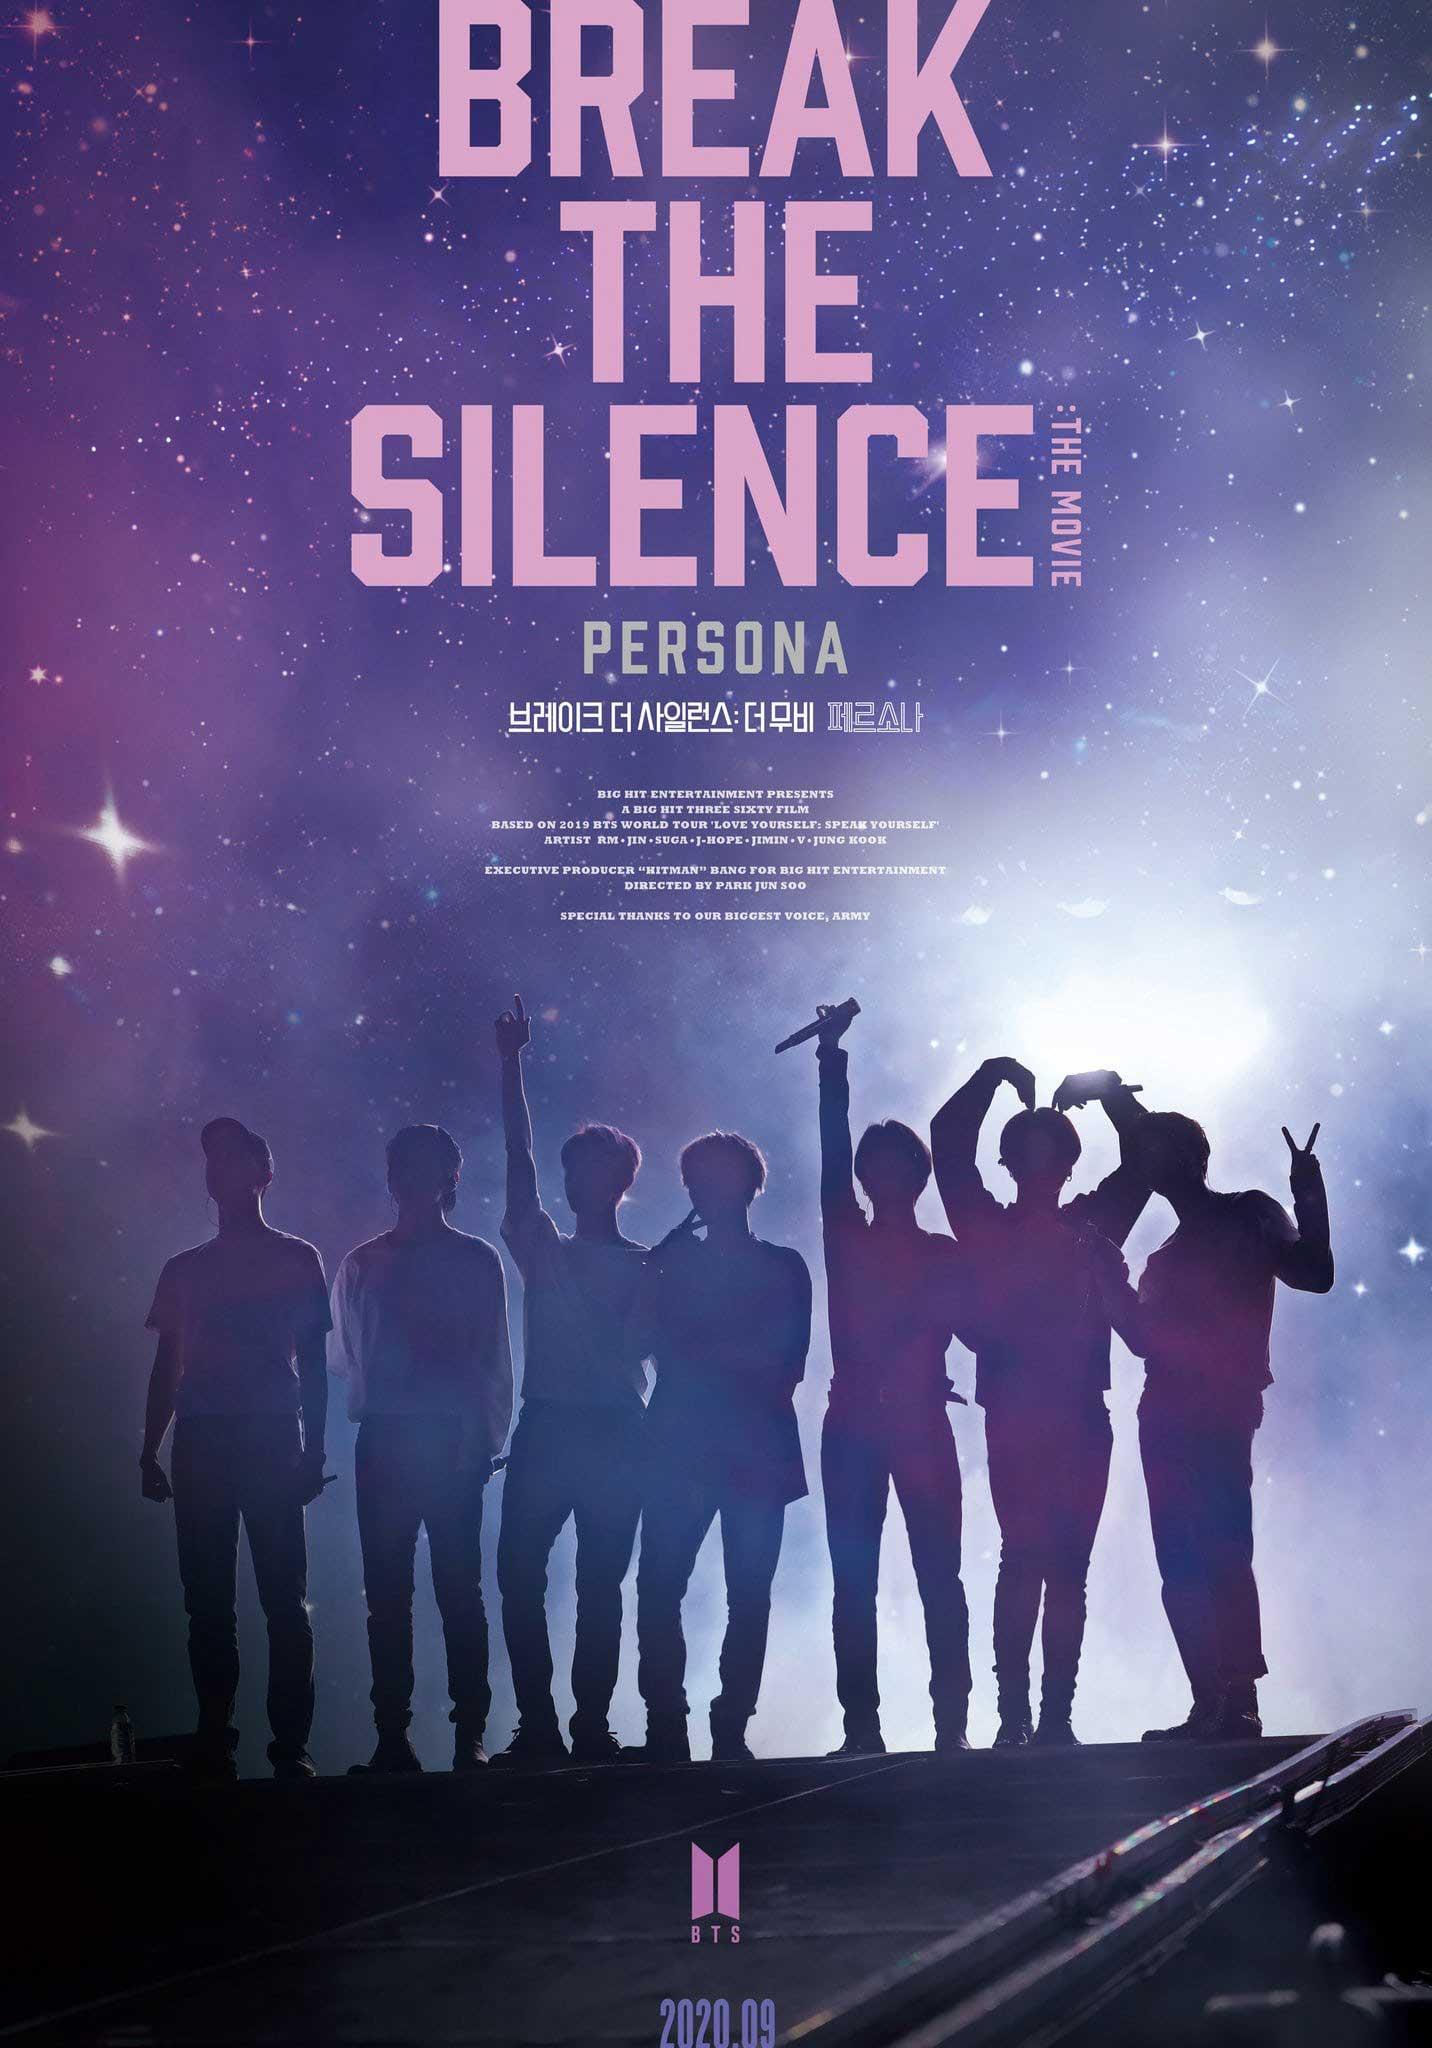 Break-The-Silence-The-Movie